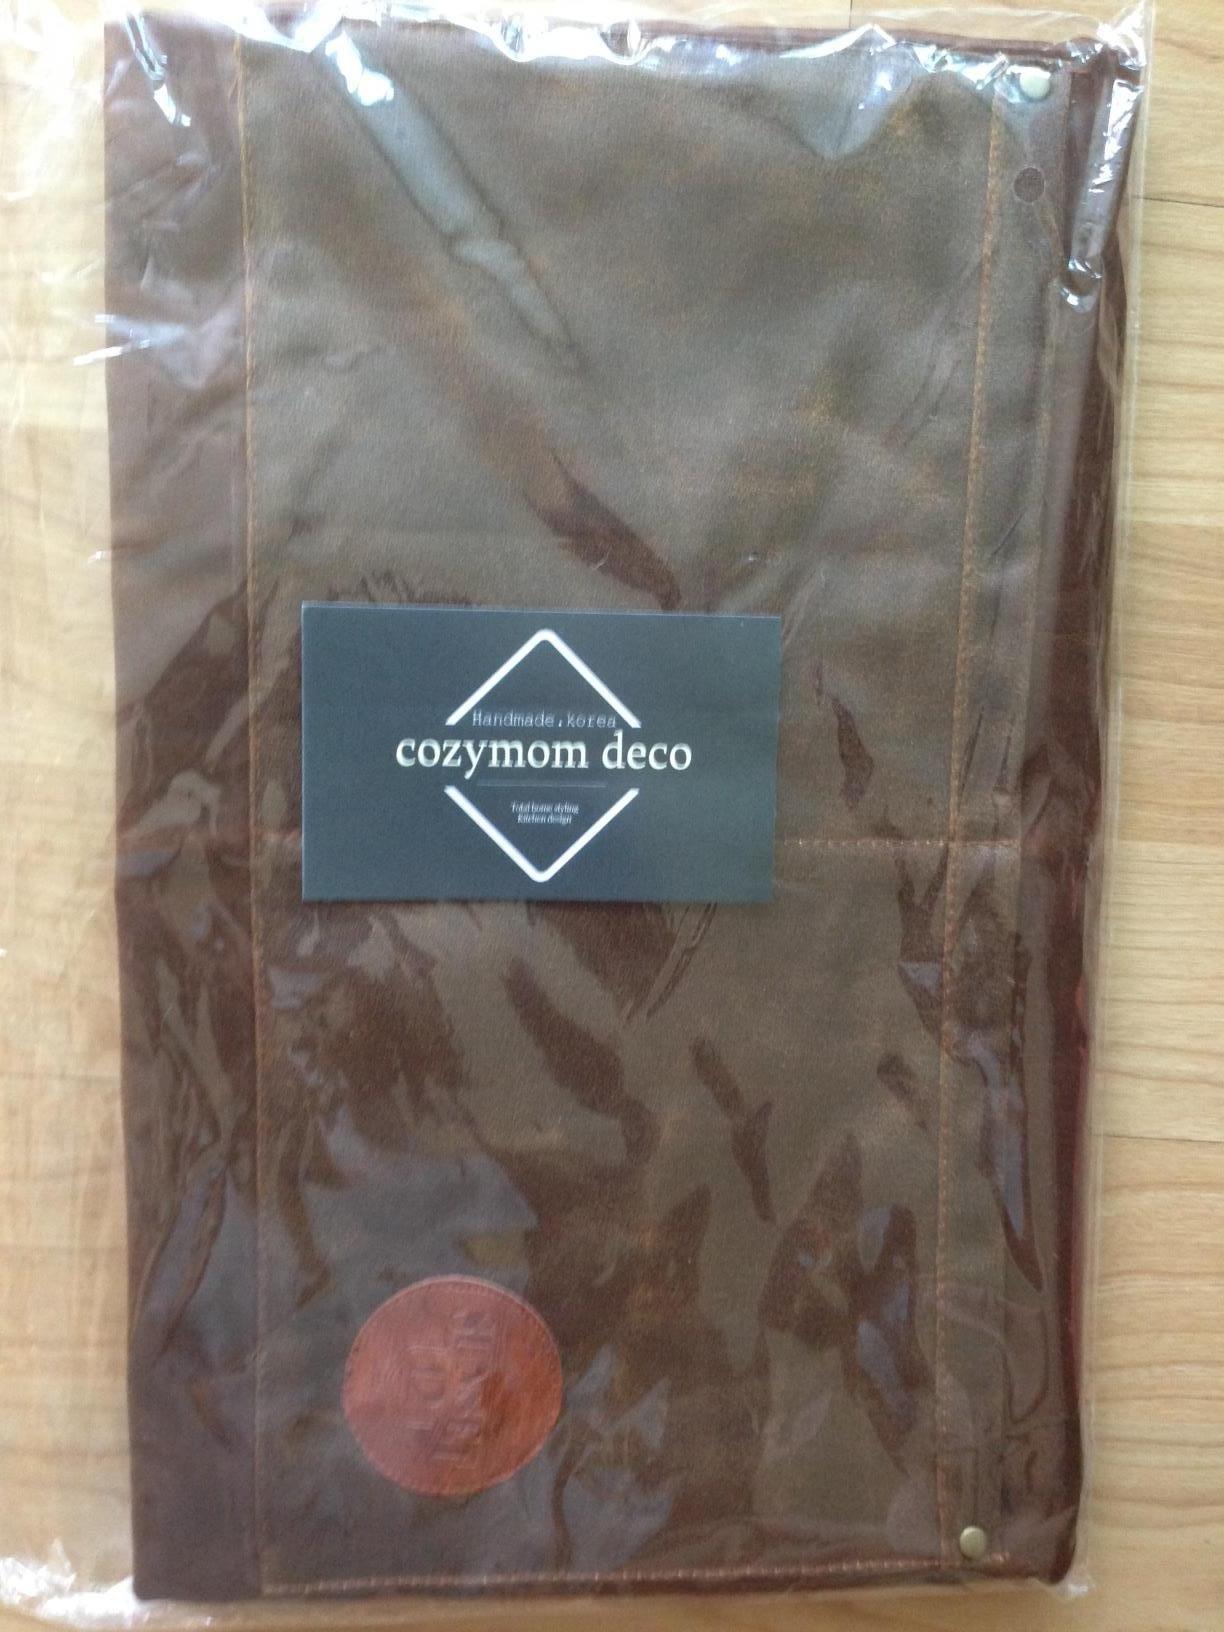 Cozymom Handmade Cross back Fake leather Utility Apron - Brown color